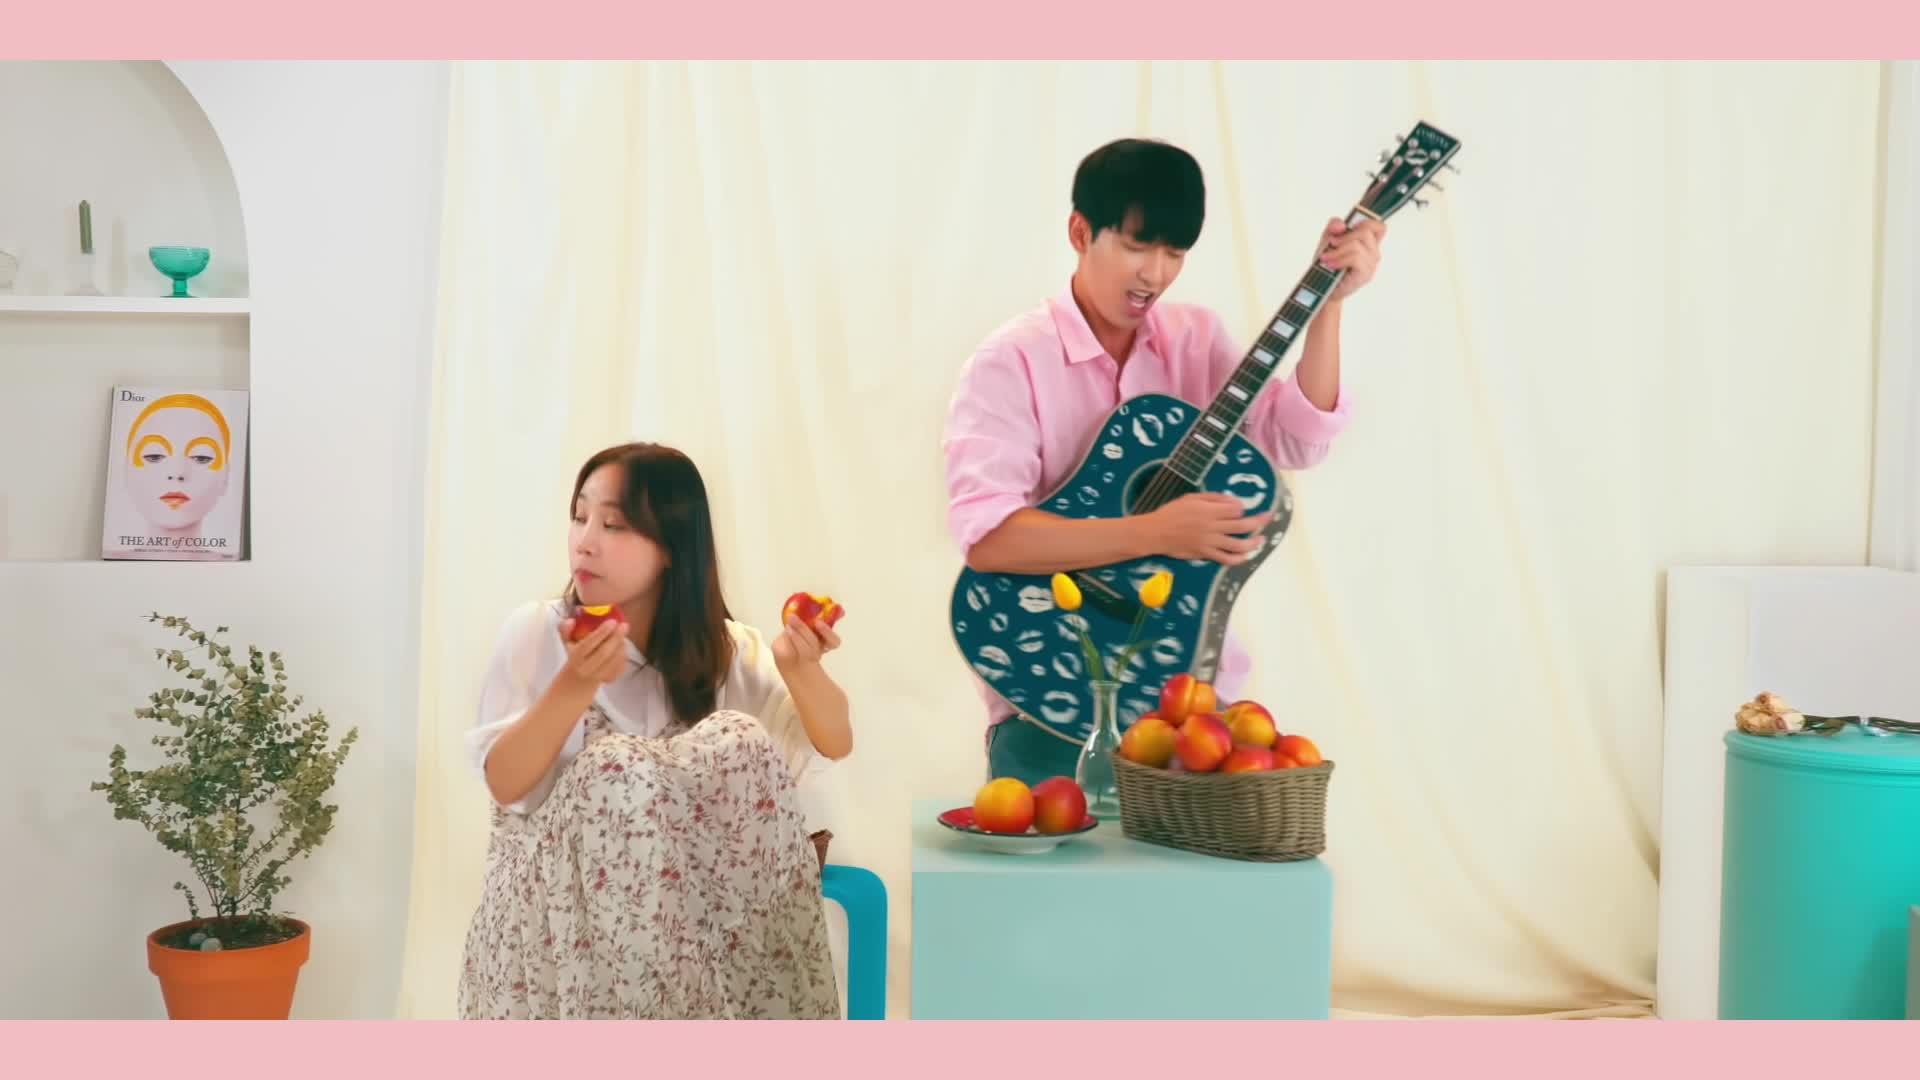 [M/V] Peach (Feat. Henry) 복숭아 (Feat. 헨리) - Jung Mo (정모)